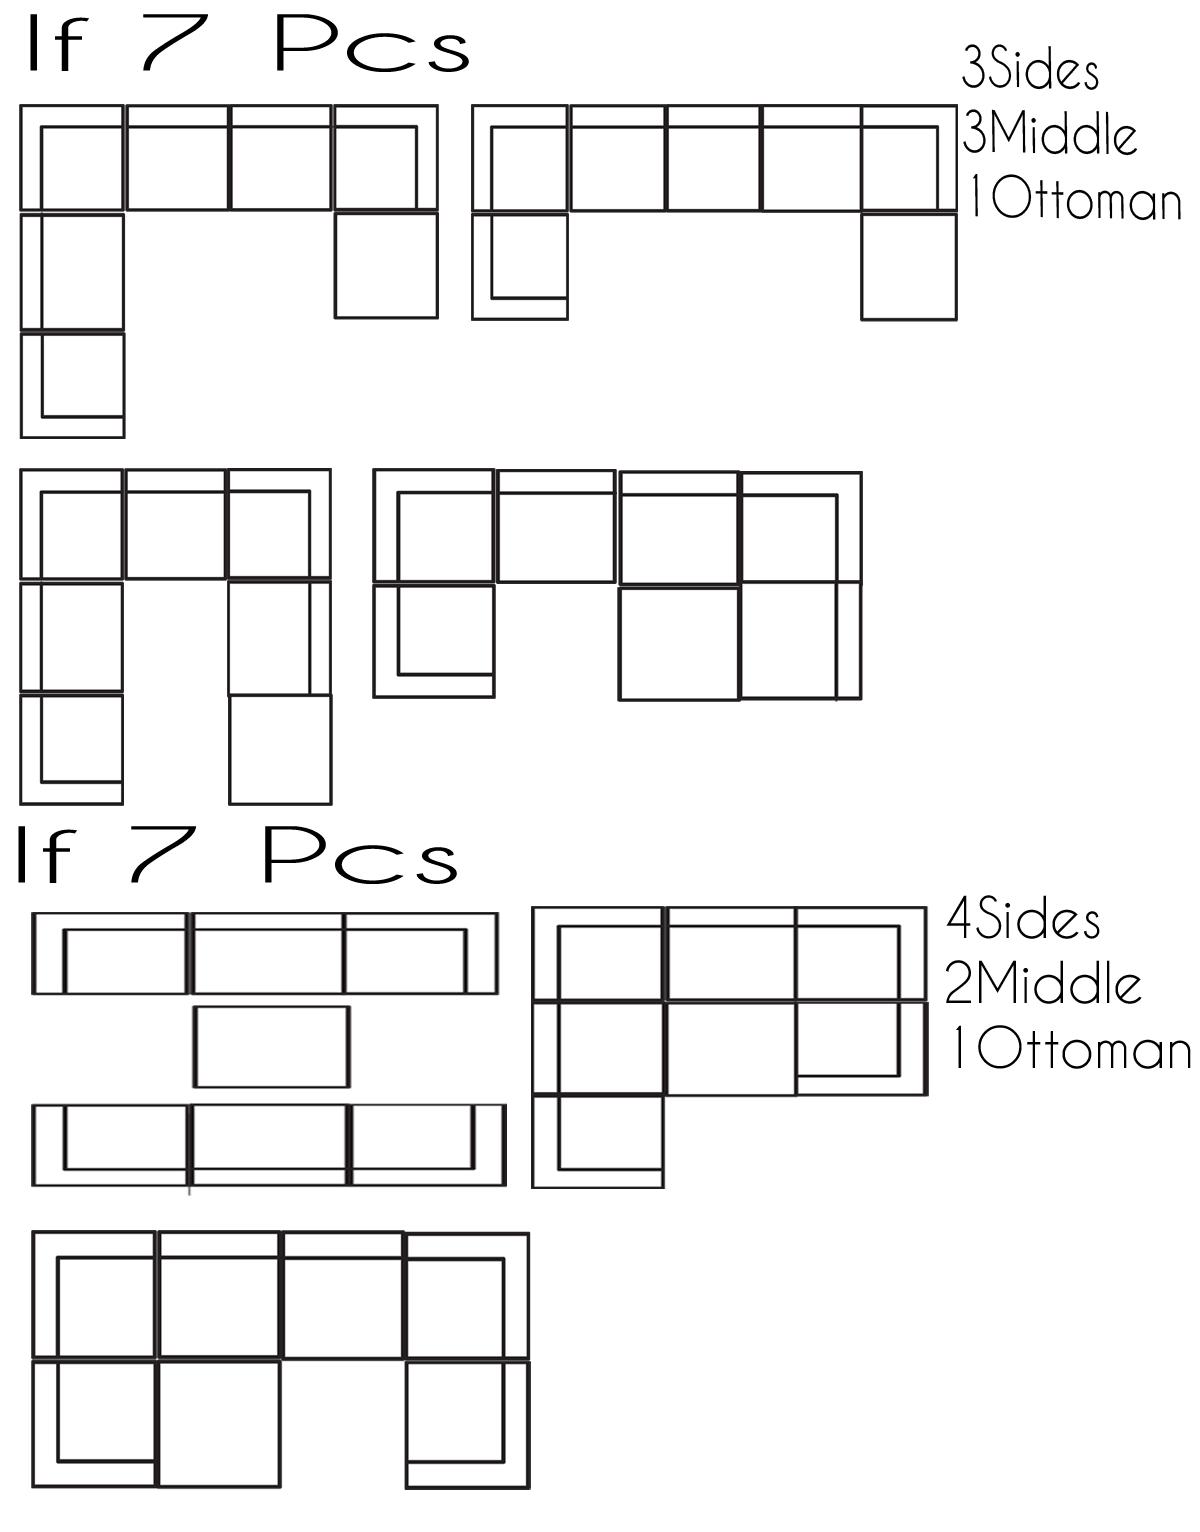 Modular Layout 7 Pcs.png